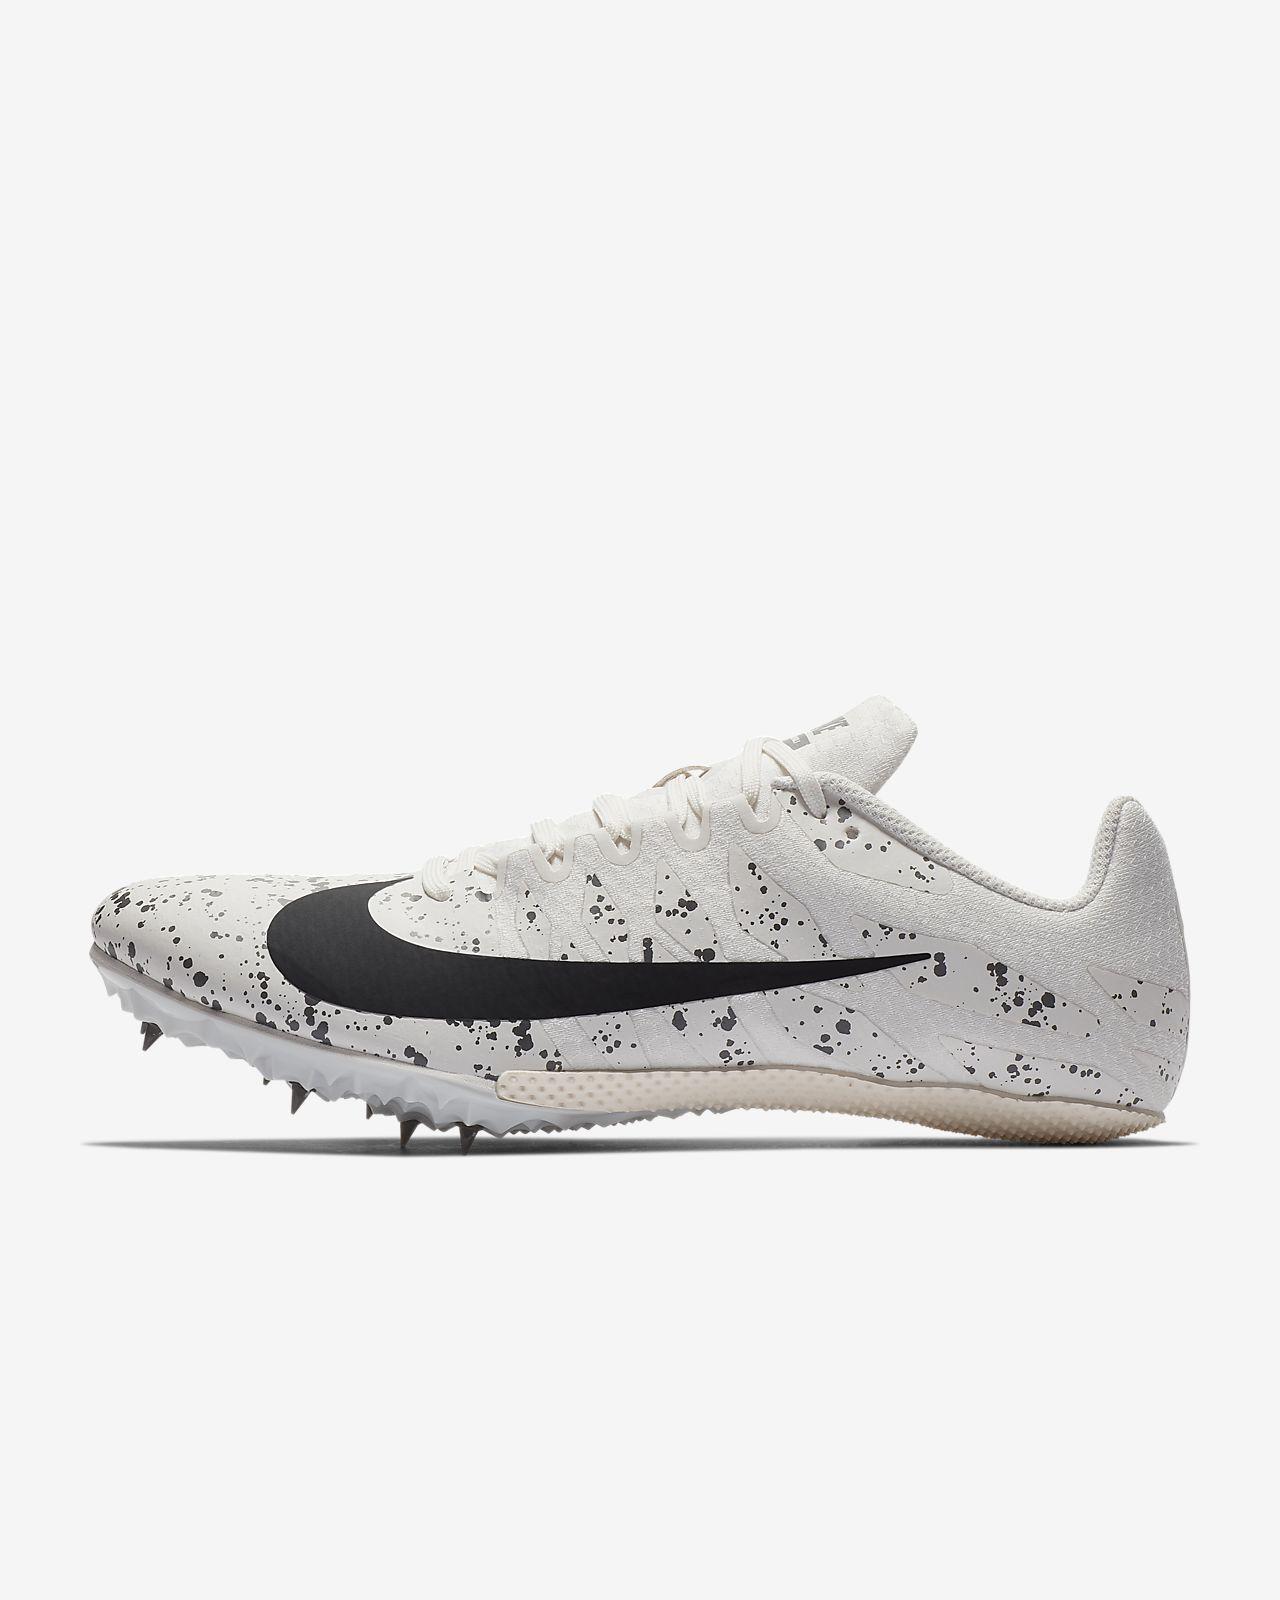 6c7fff81f5ce2 Scarpa chiodata per atletica Nike Zoom Rival S 9 - Unisex. Nike.com IT